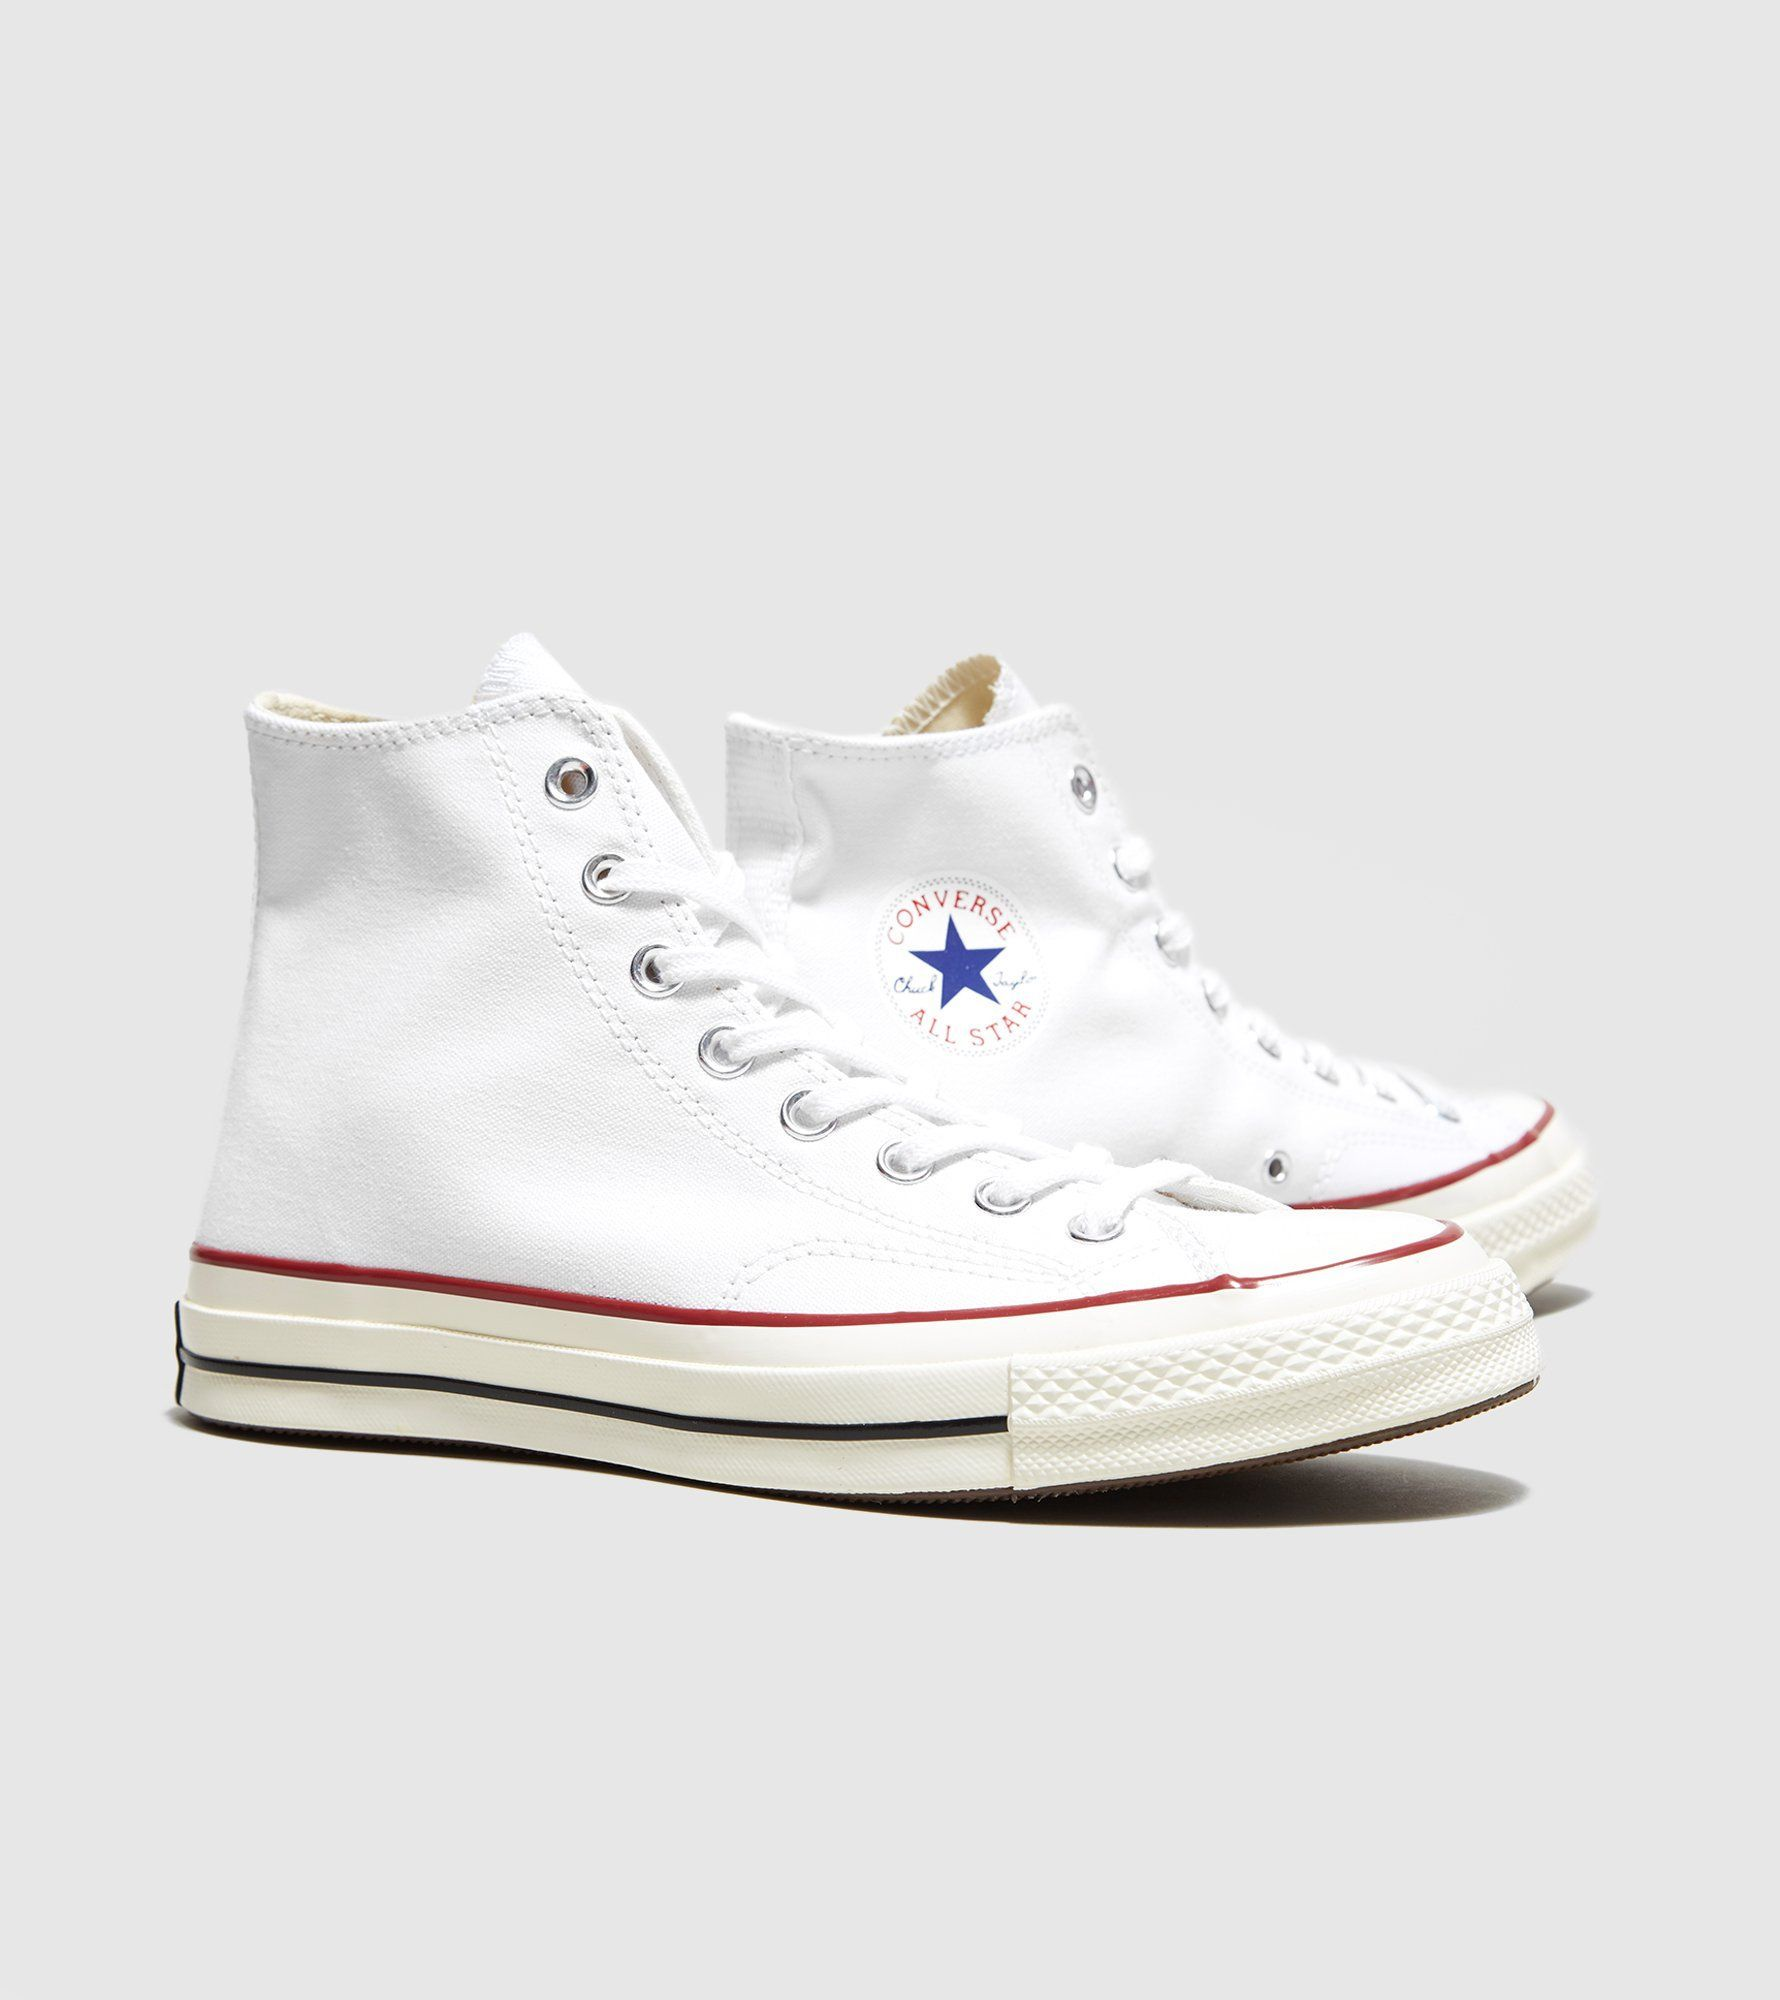 c2996619b33 Converse Chuck Taylor All Star  70 Hi ...